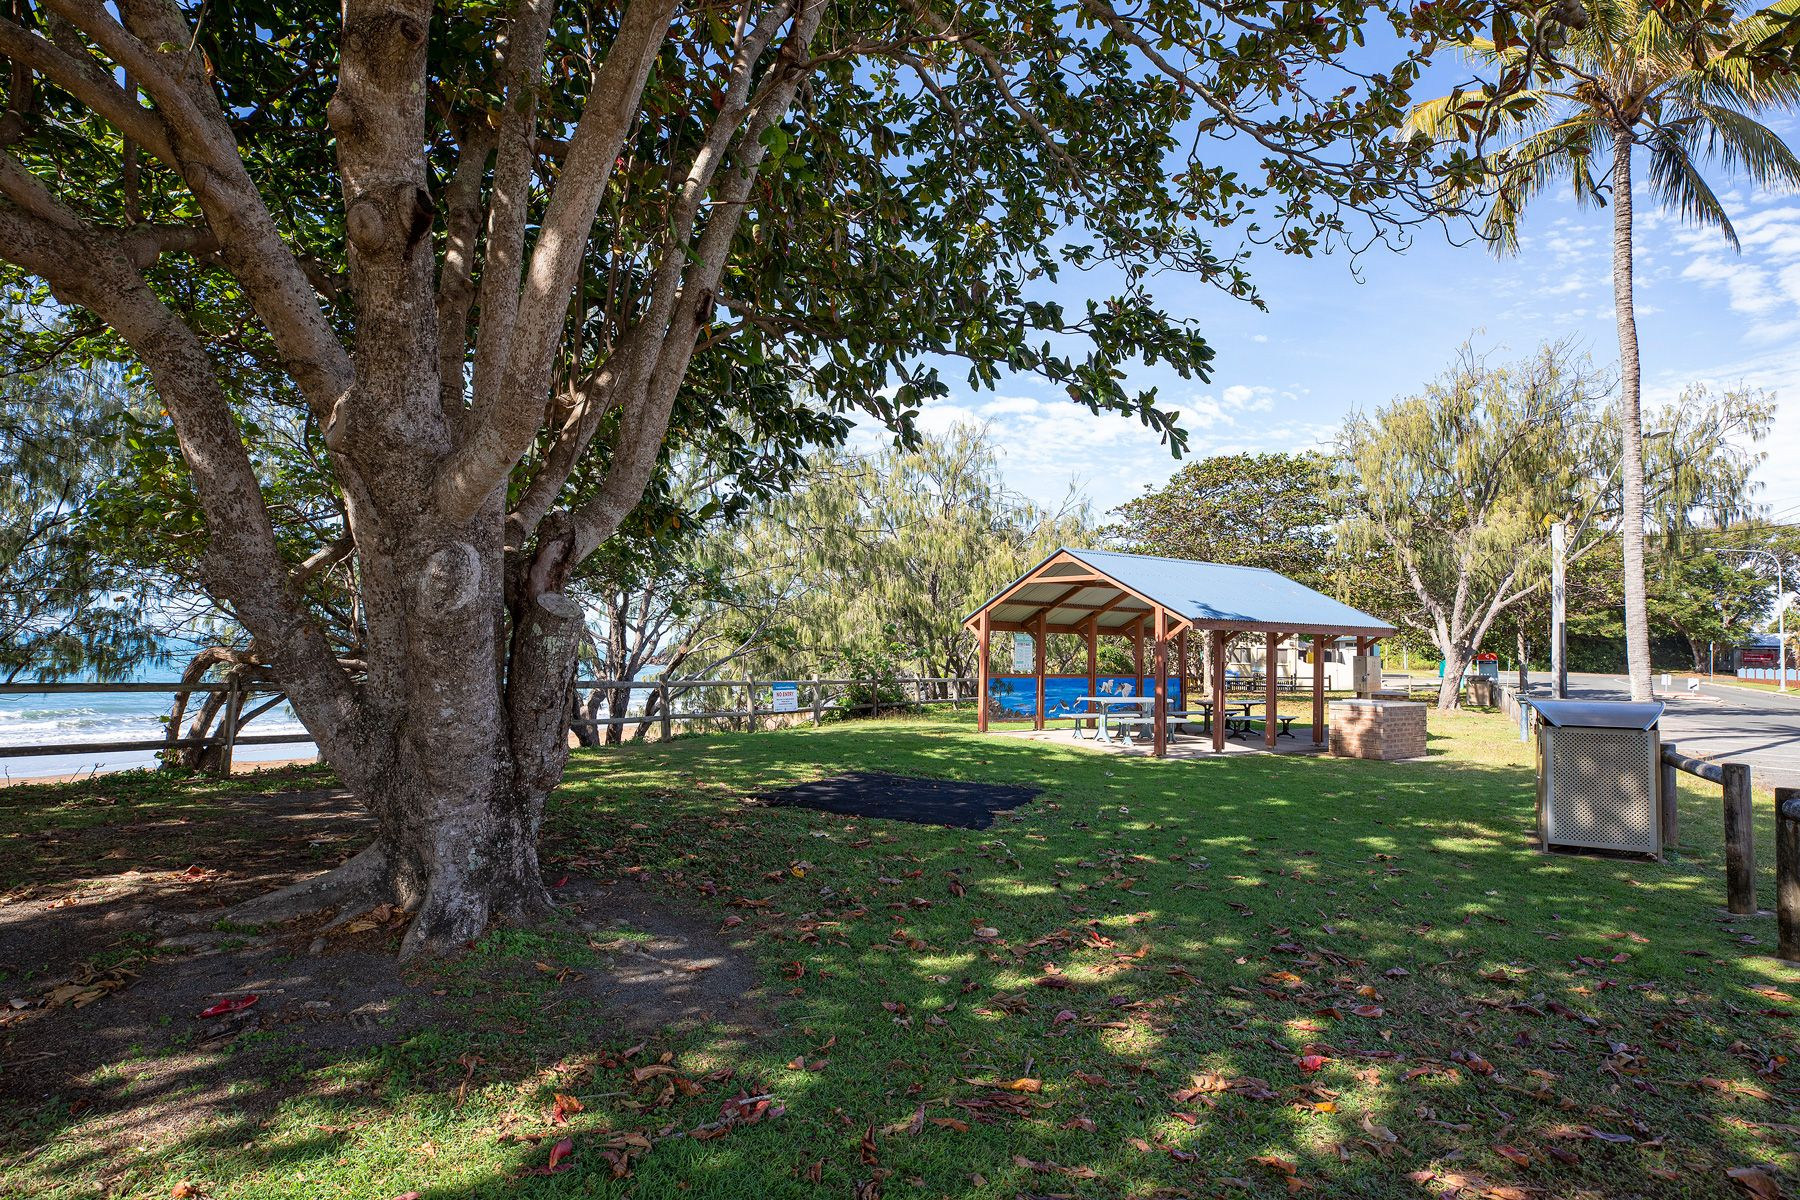 1/47 Owen Jenkins Drive, Sarina Beach, QLD 4737